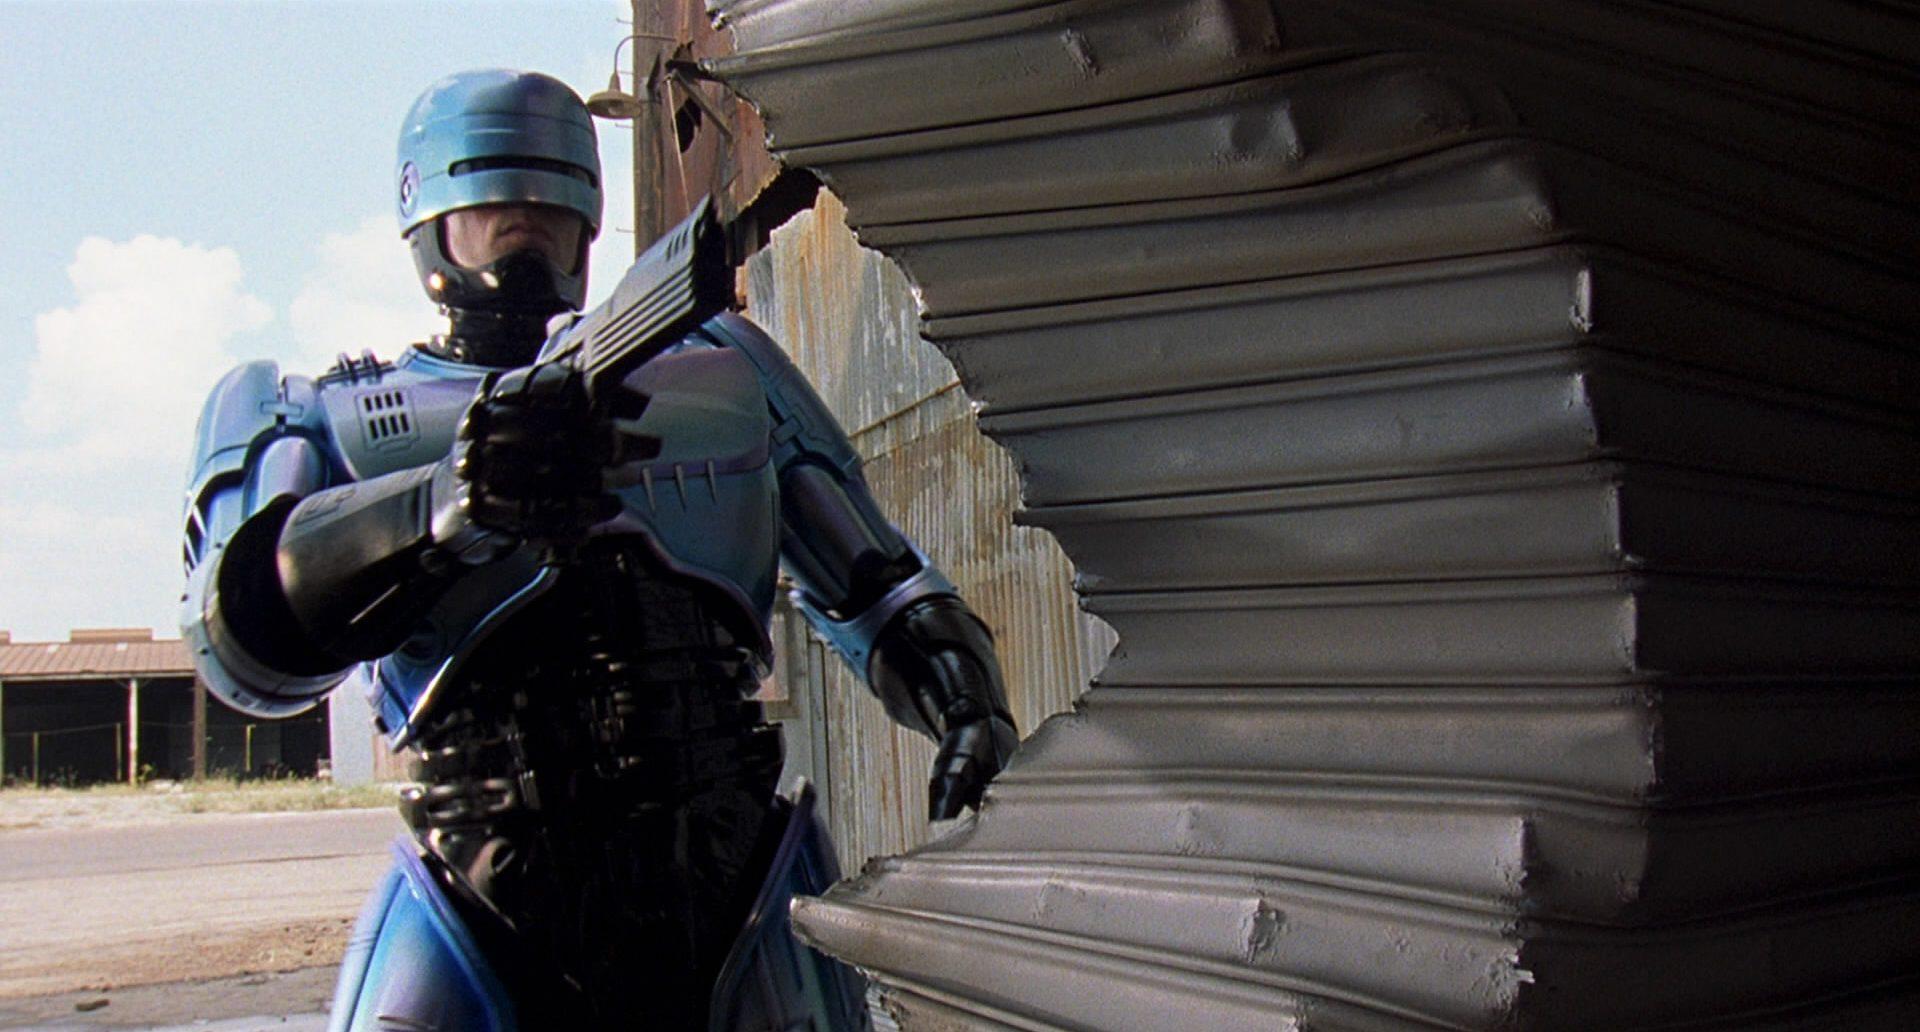 2b 2 e1609346948881 20 Futuristic Facts About RoboCop 2